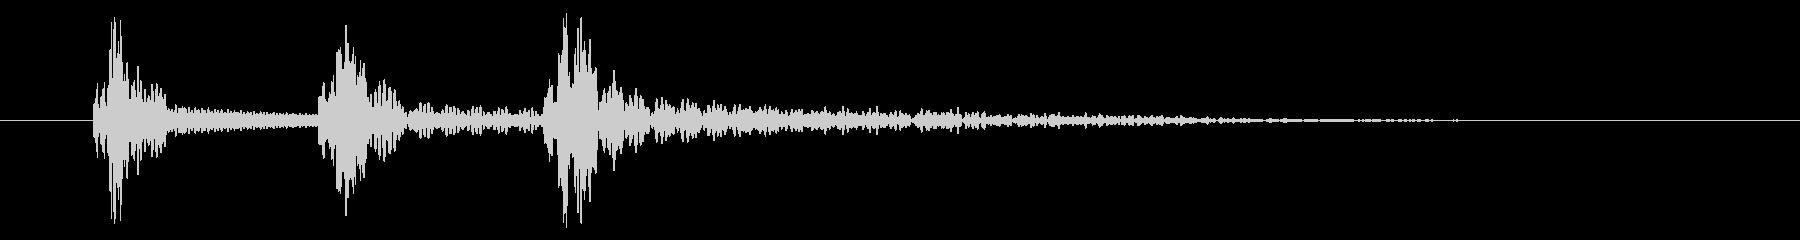 PC・アプリ操作音向け電子音(ポコポン)の未再生の波形